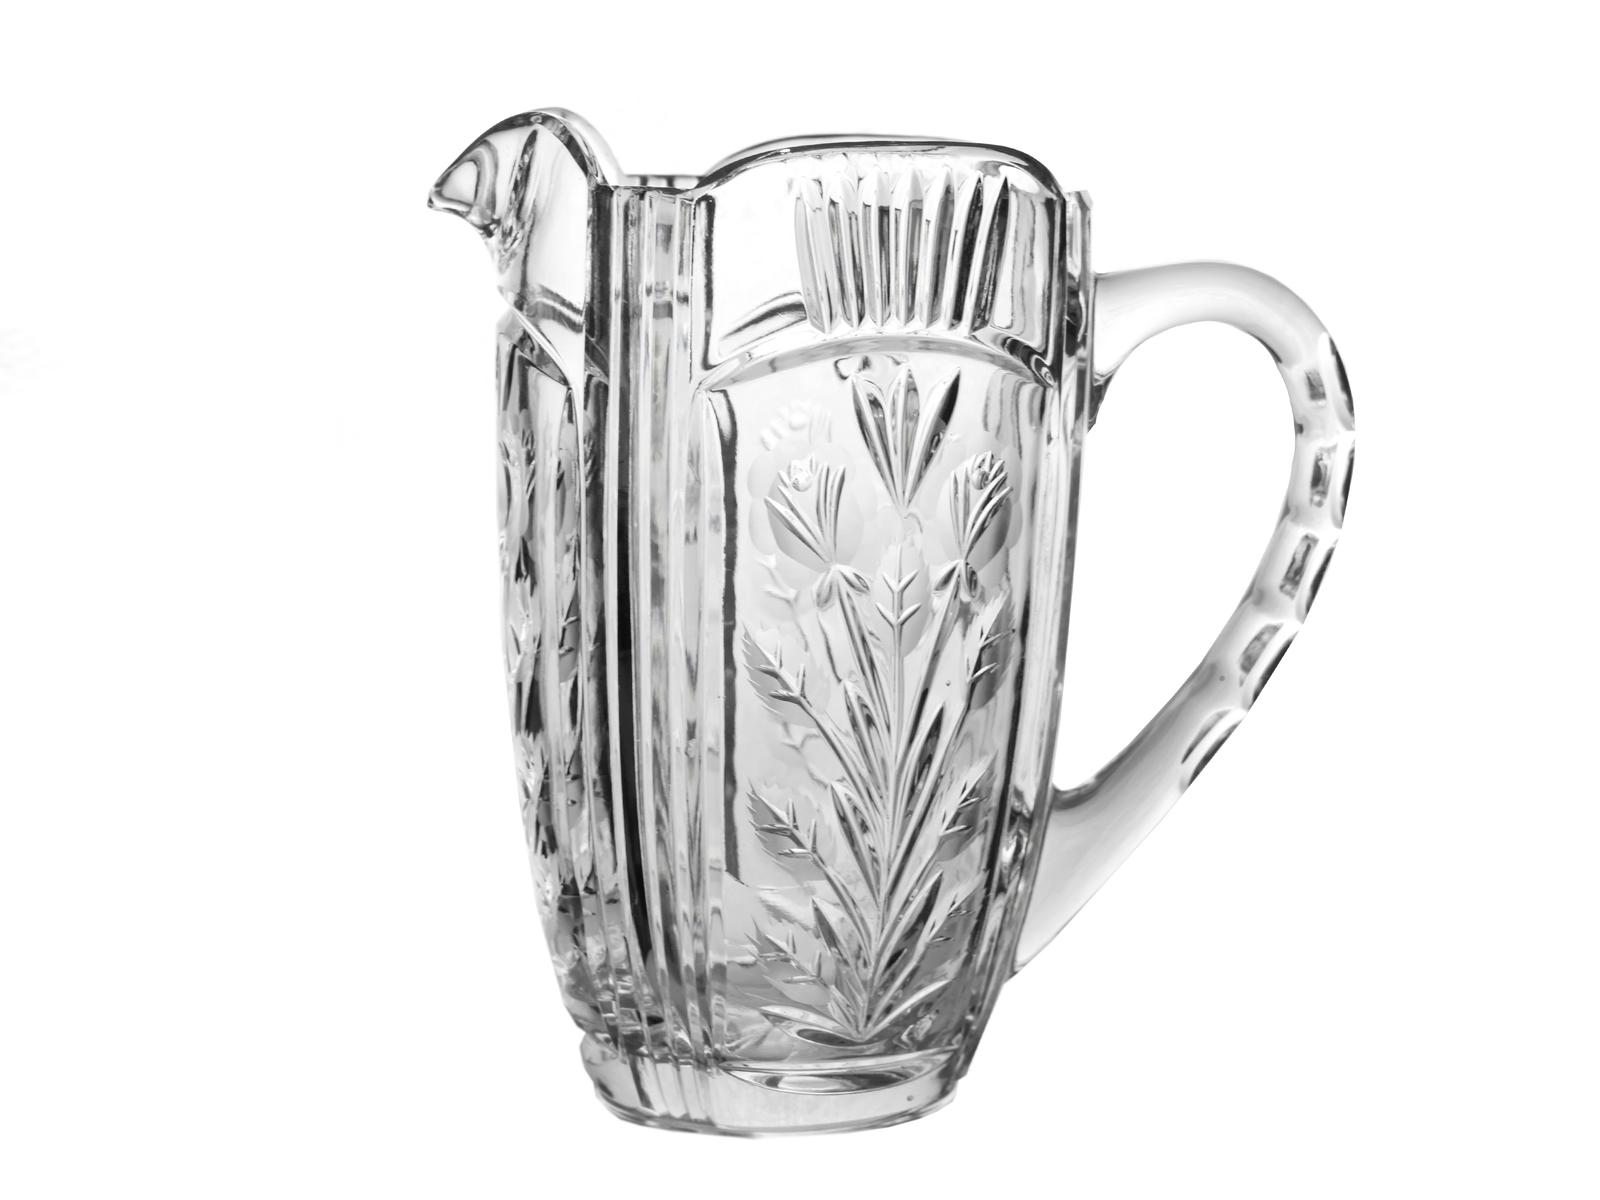 Vintage Heavy Cut Etched Floral Design Clear Crystal Glass Pitcher Serving Drink - $140.00